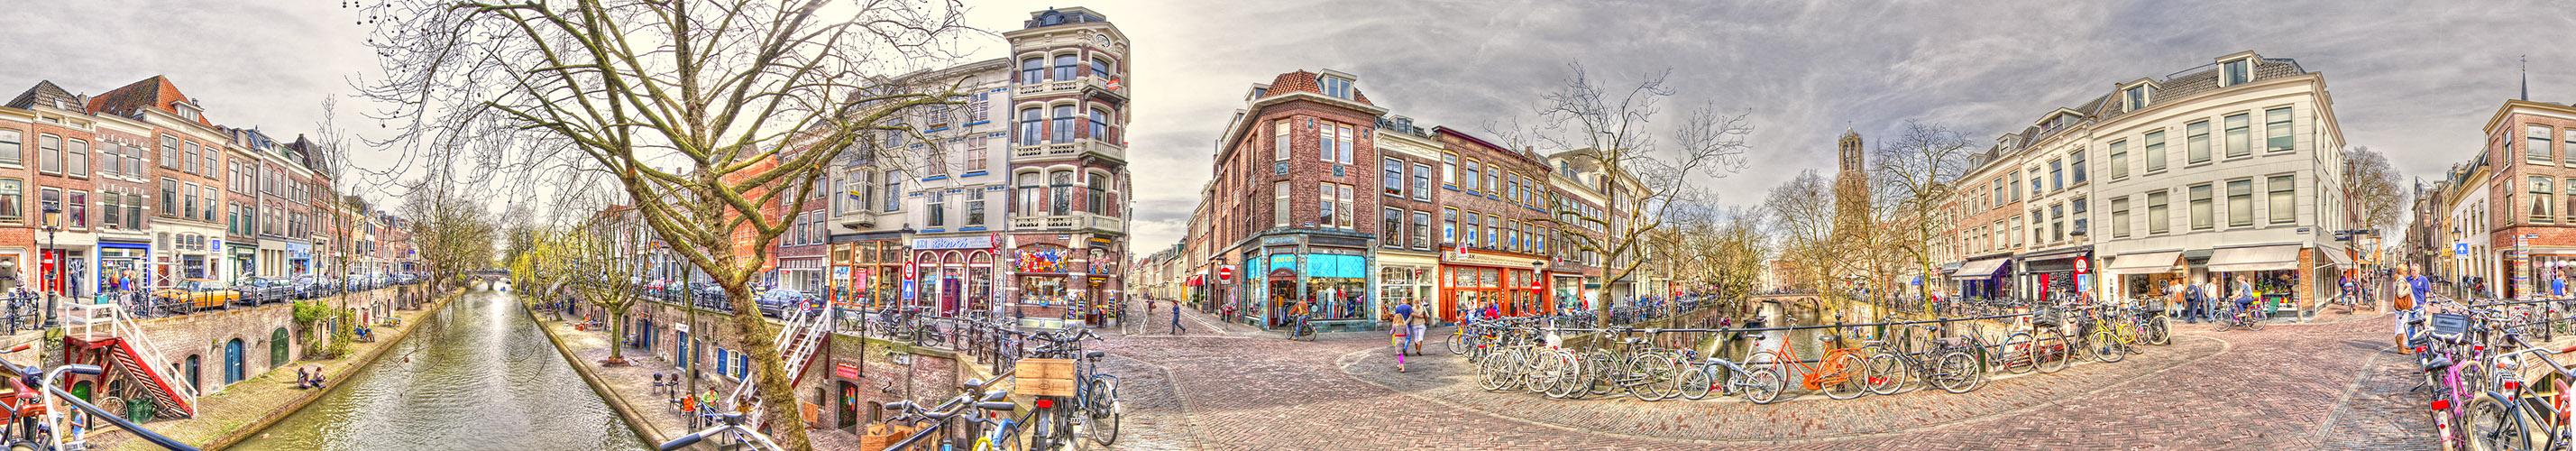 Utrecht fx Panorama HDR 2 02